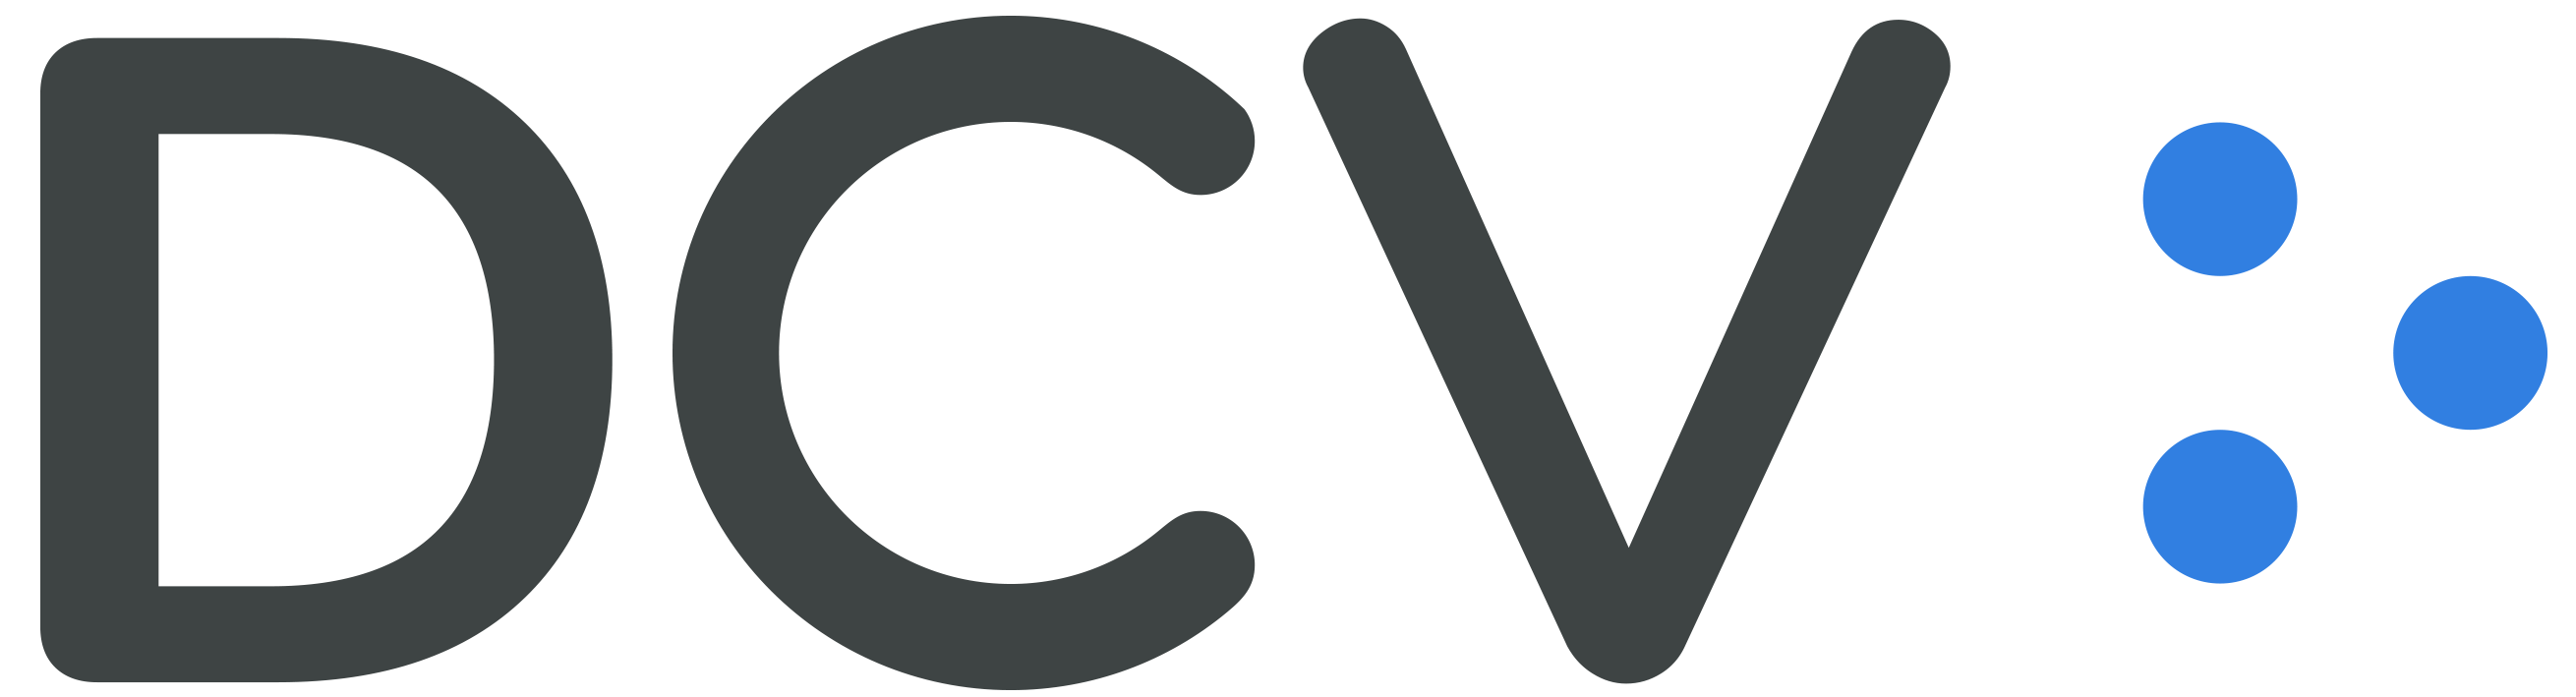 DCV Grupos de interés externos